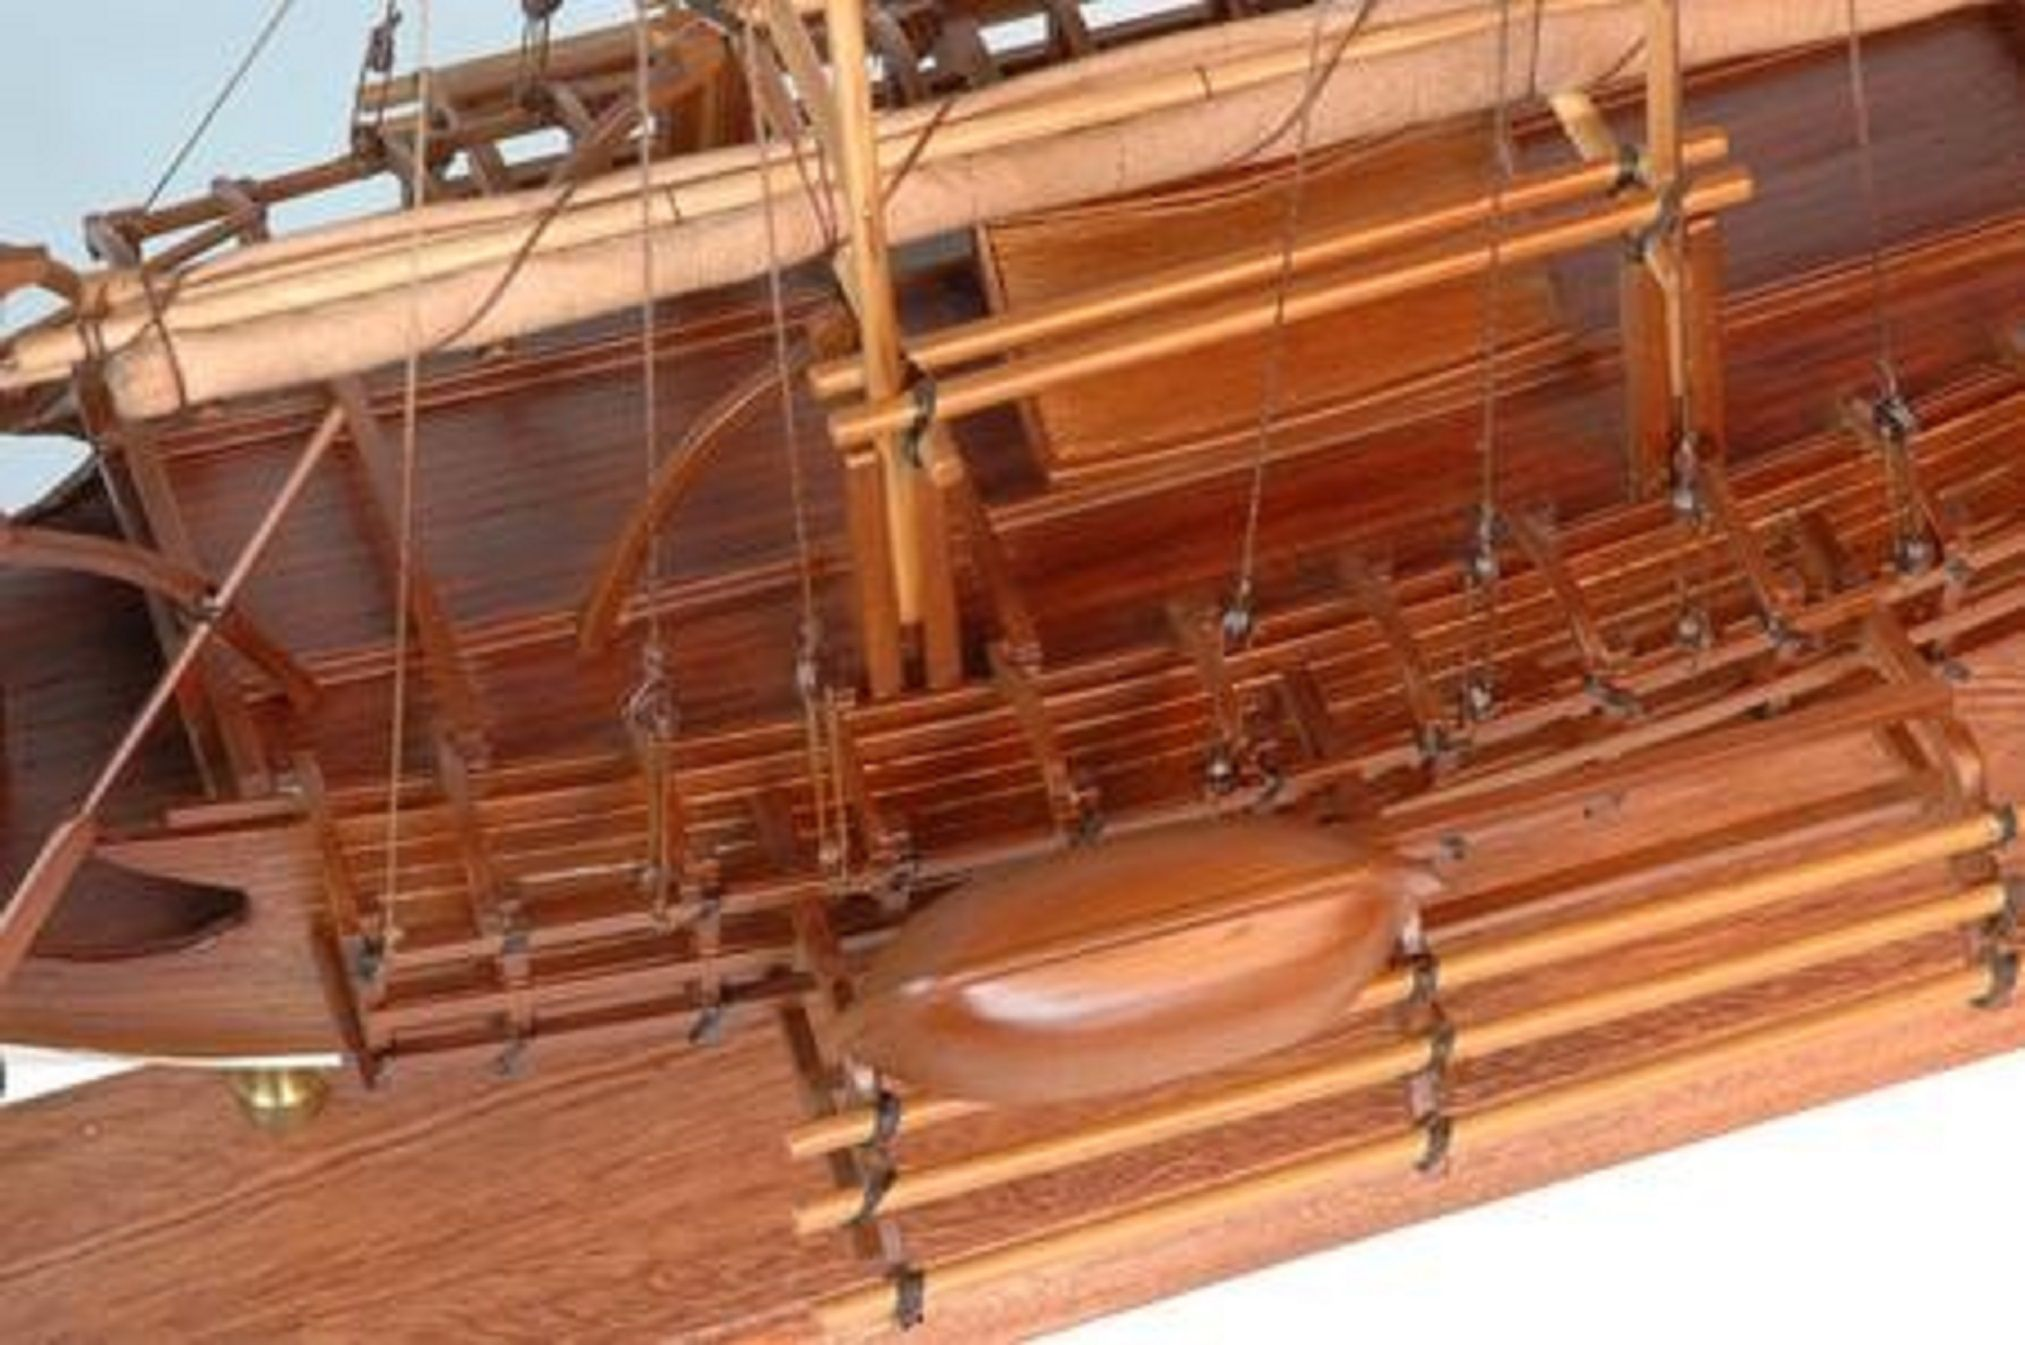 229-6983-Borobudur-model-ship-Premier-Range